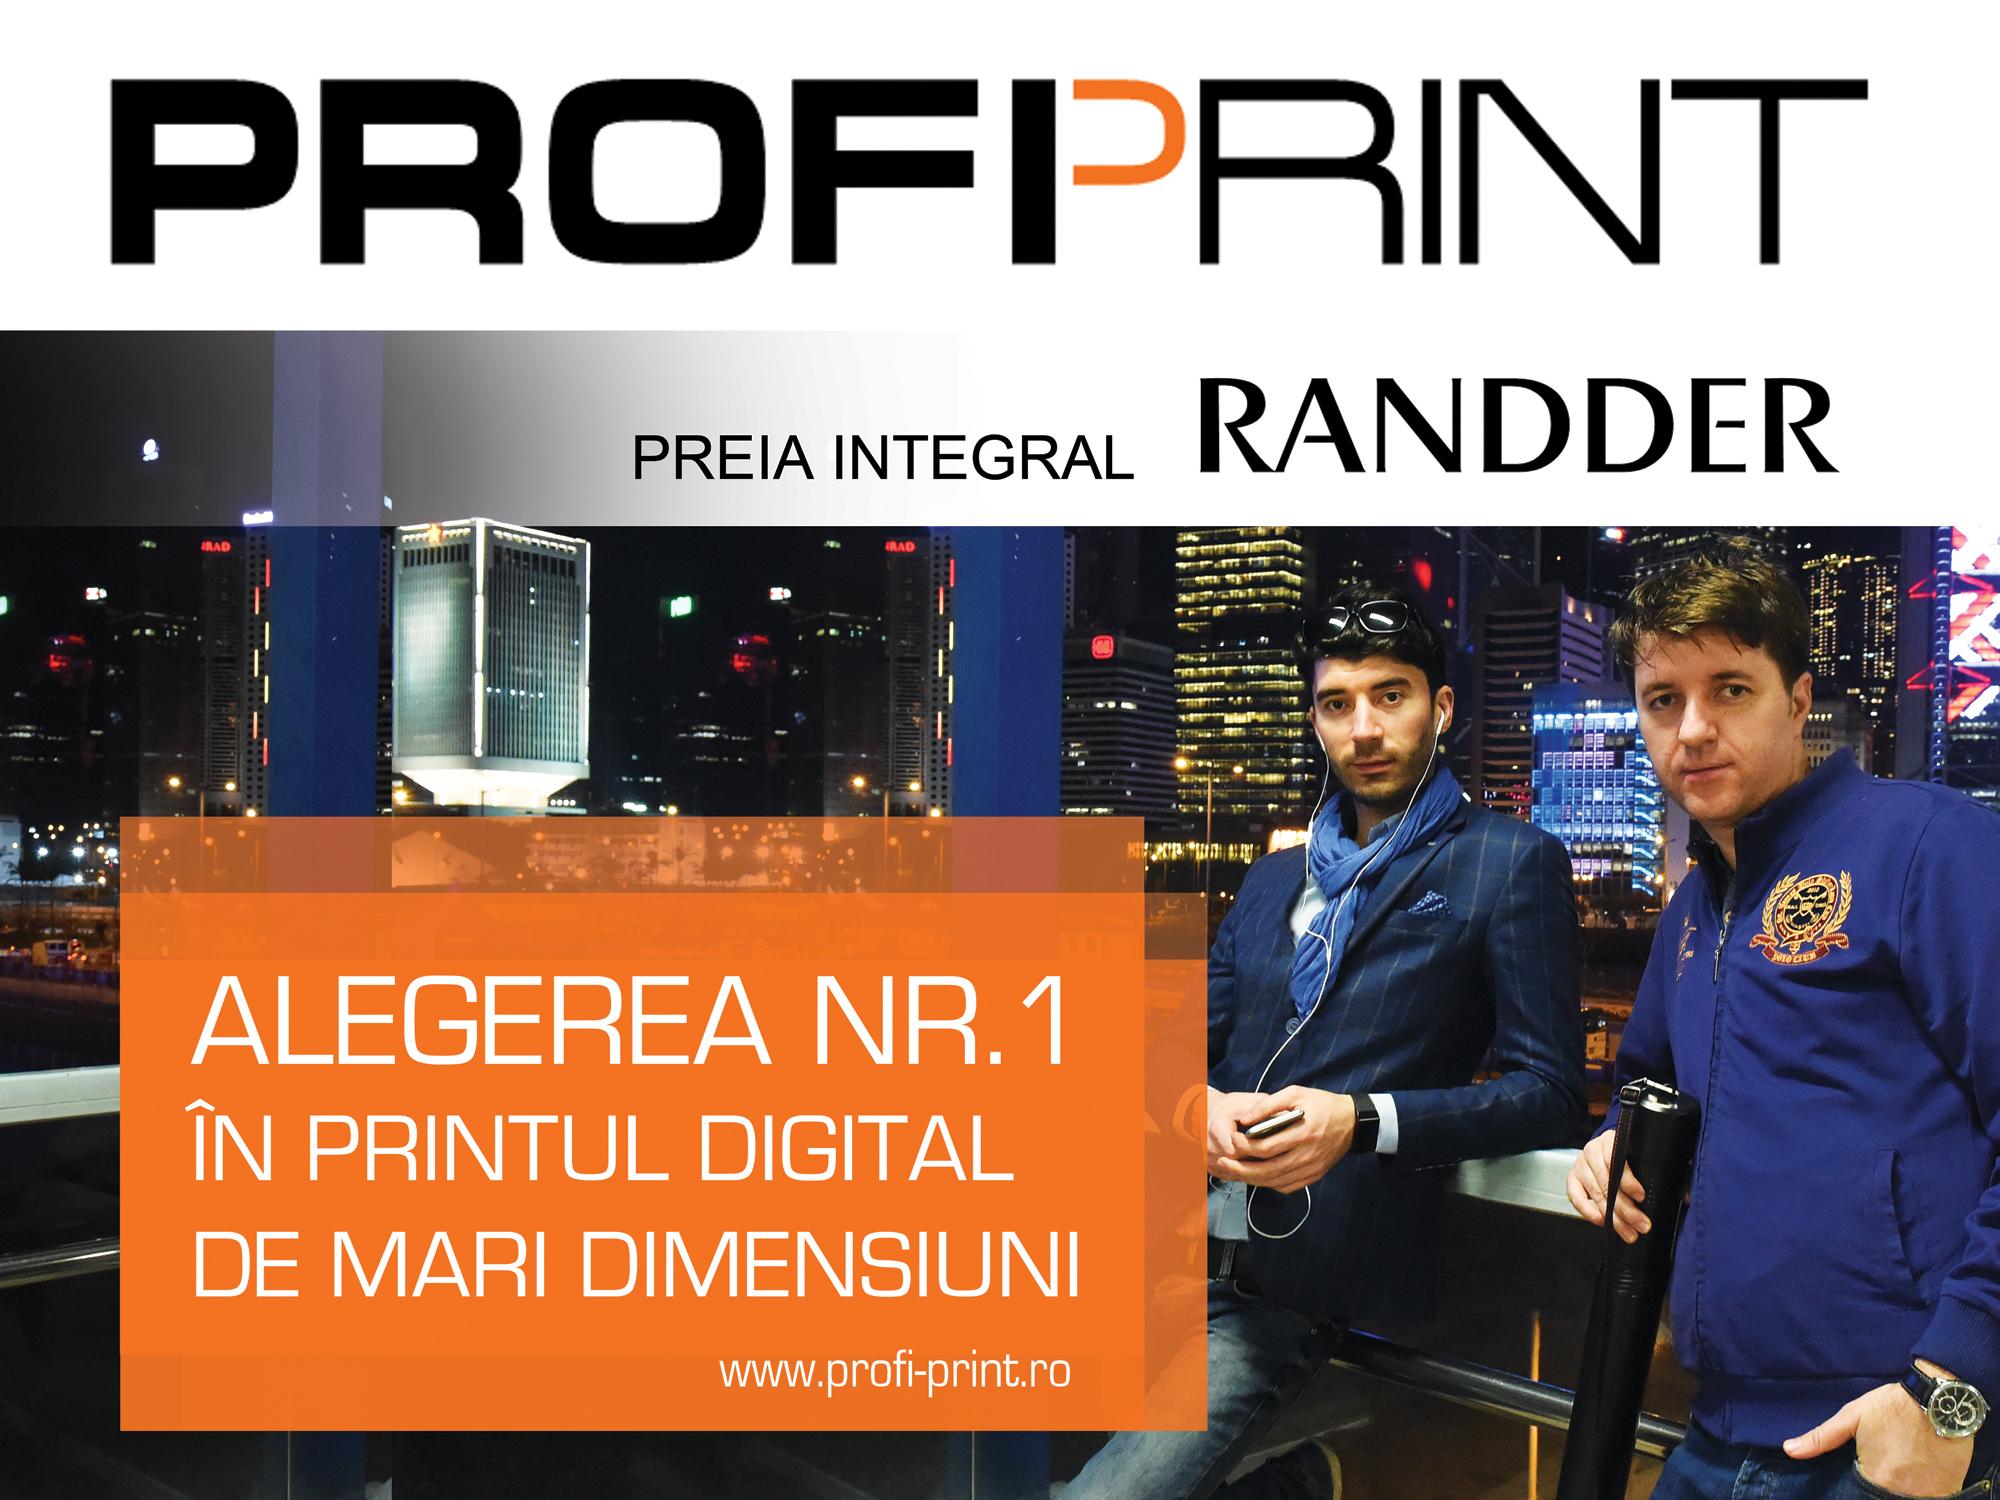 ProfiPrint - Randder